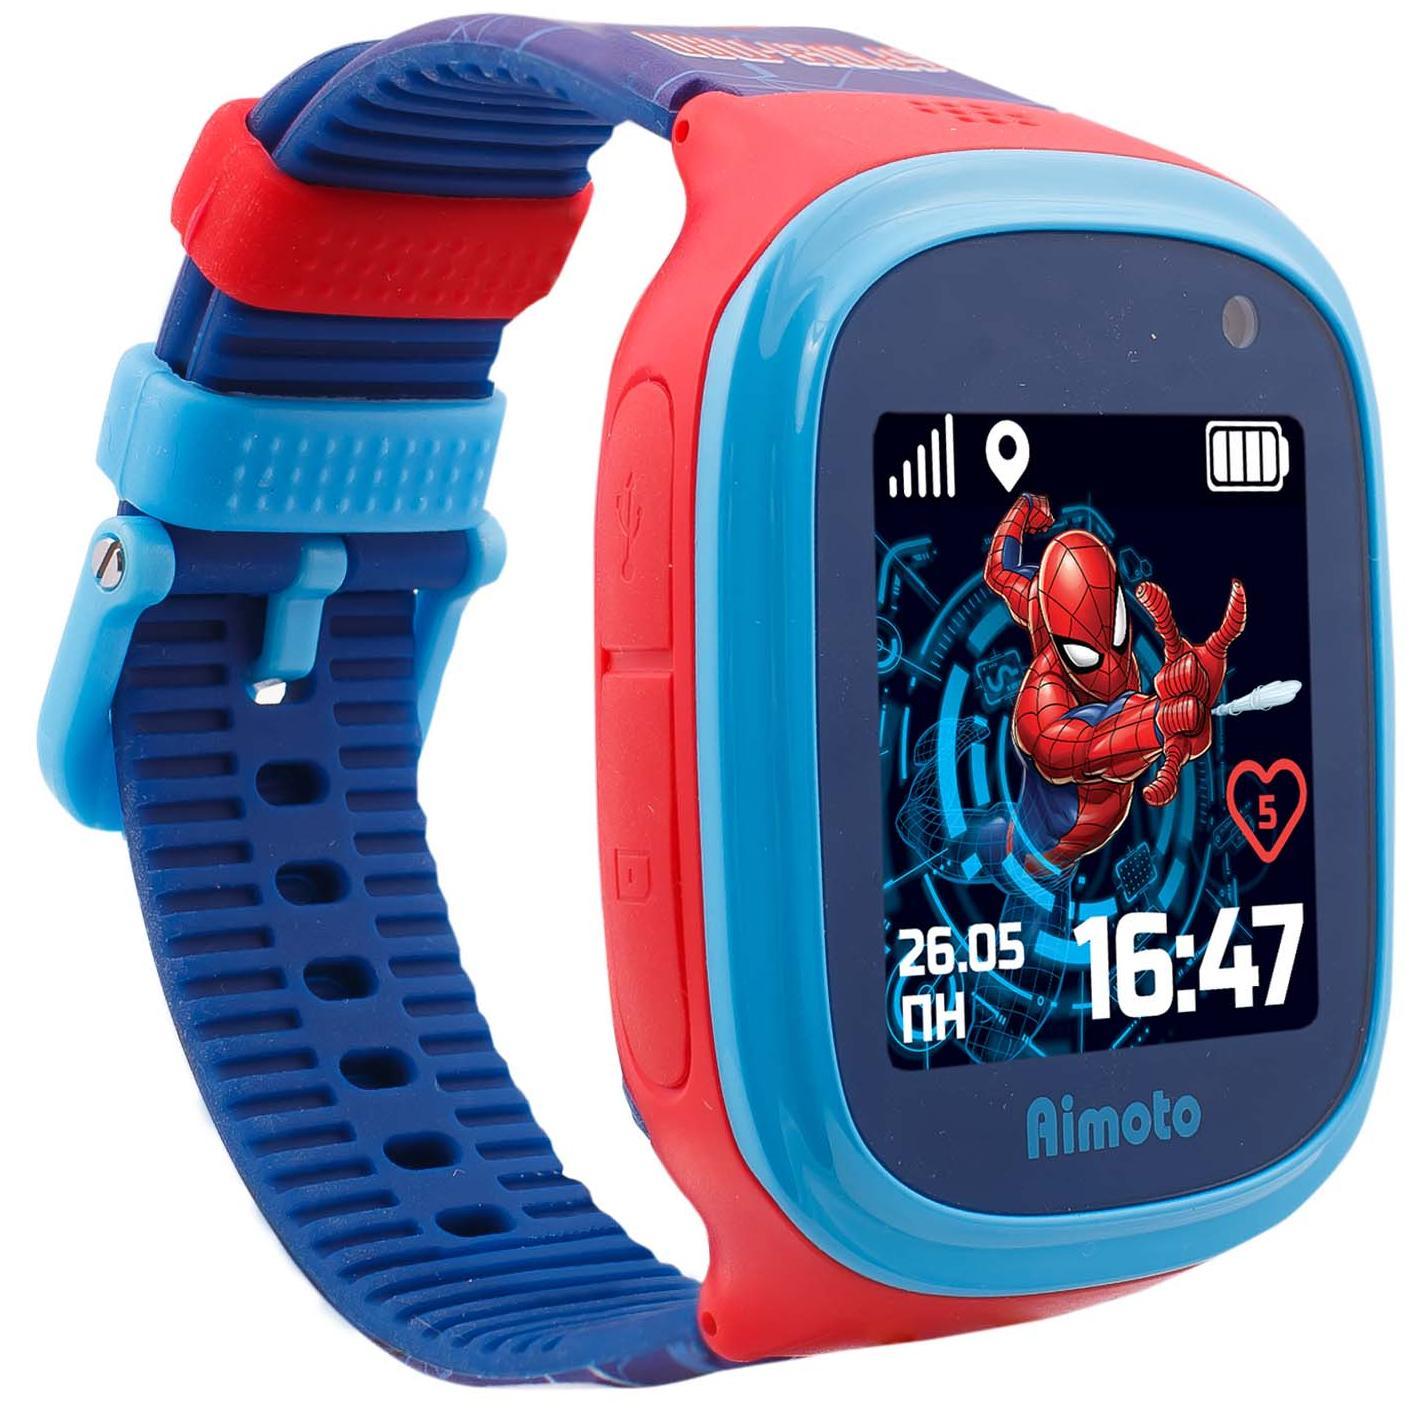 "Детские часы Кнопка Жизни Aimoto Marvel ""Человек-Паук"" (Blue/Red)"